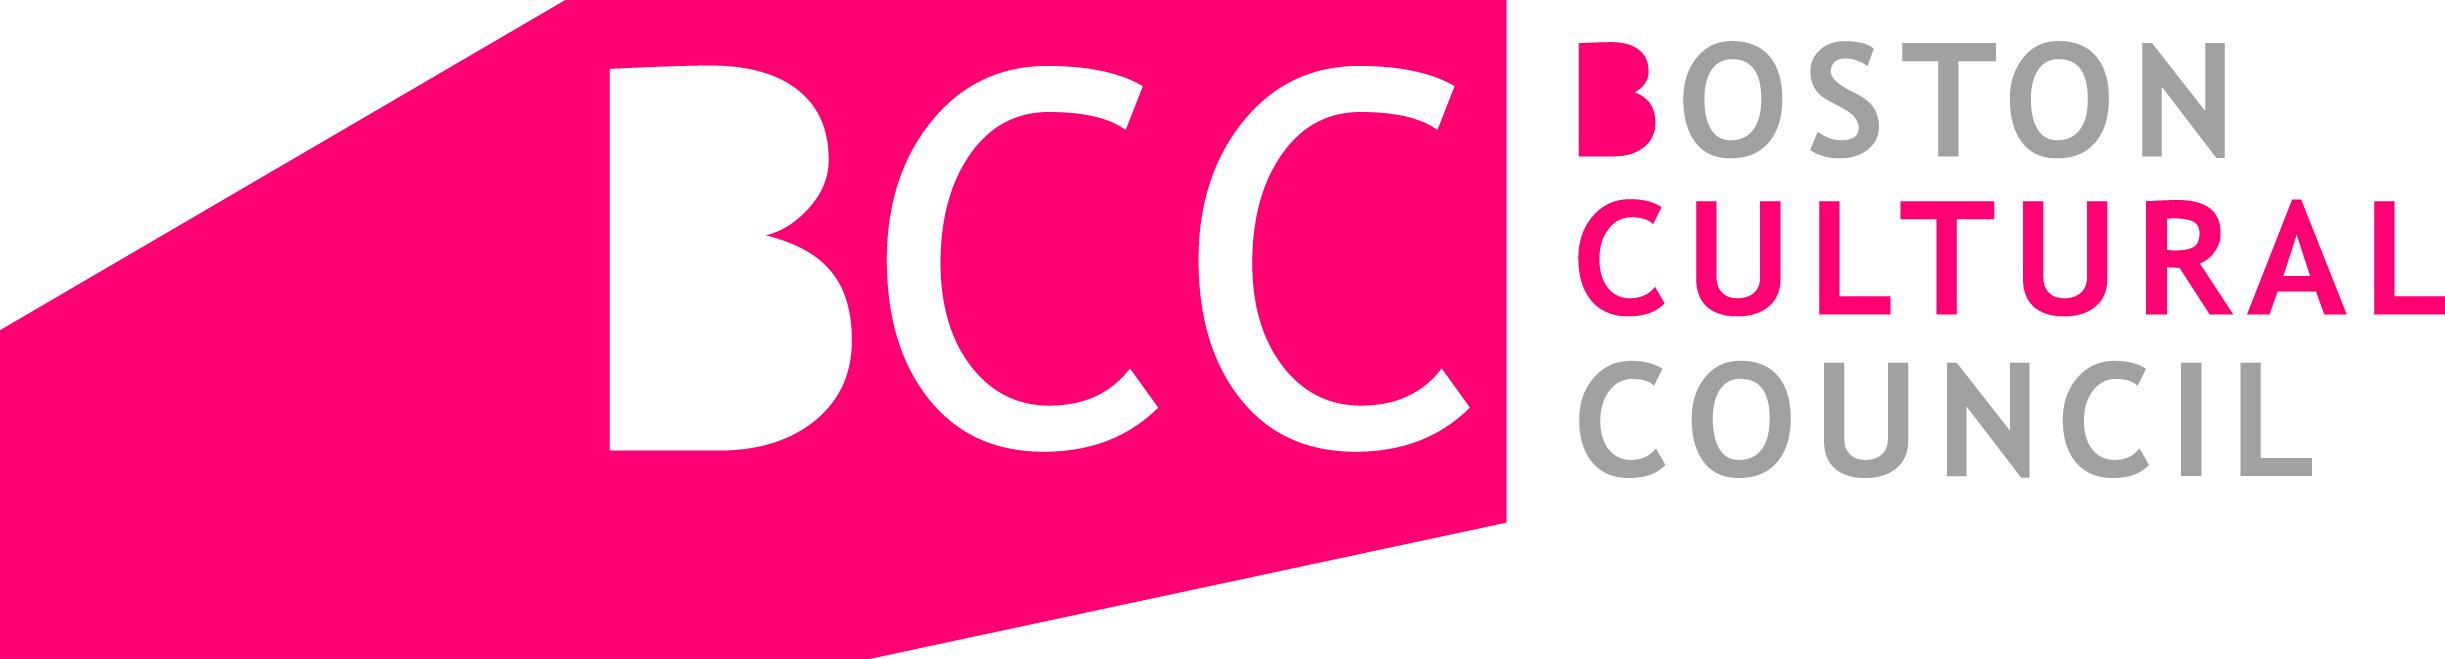 BCC.jpg